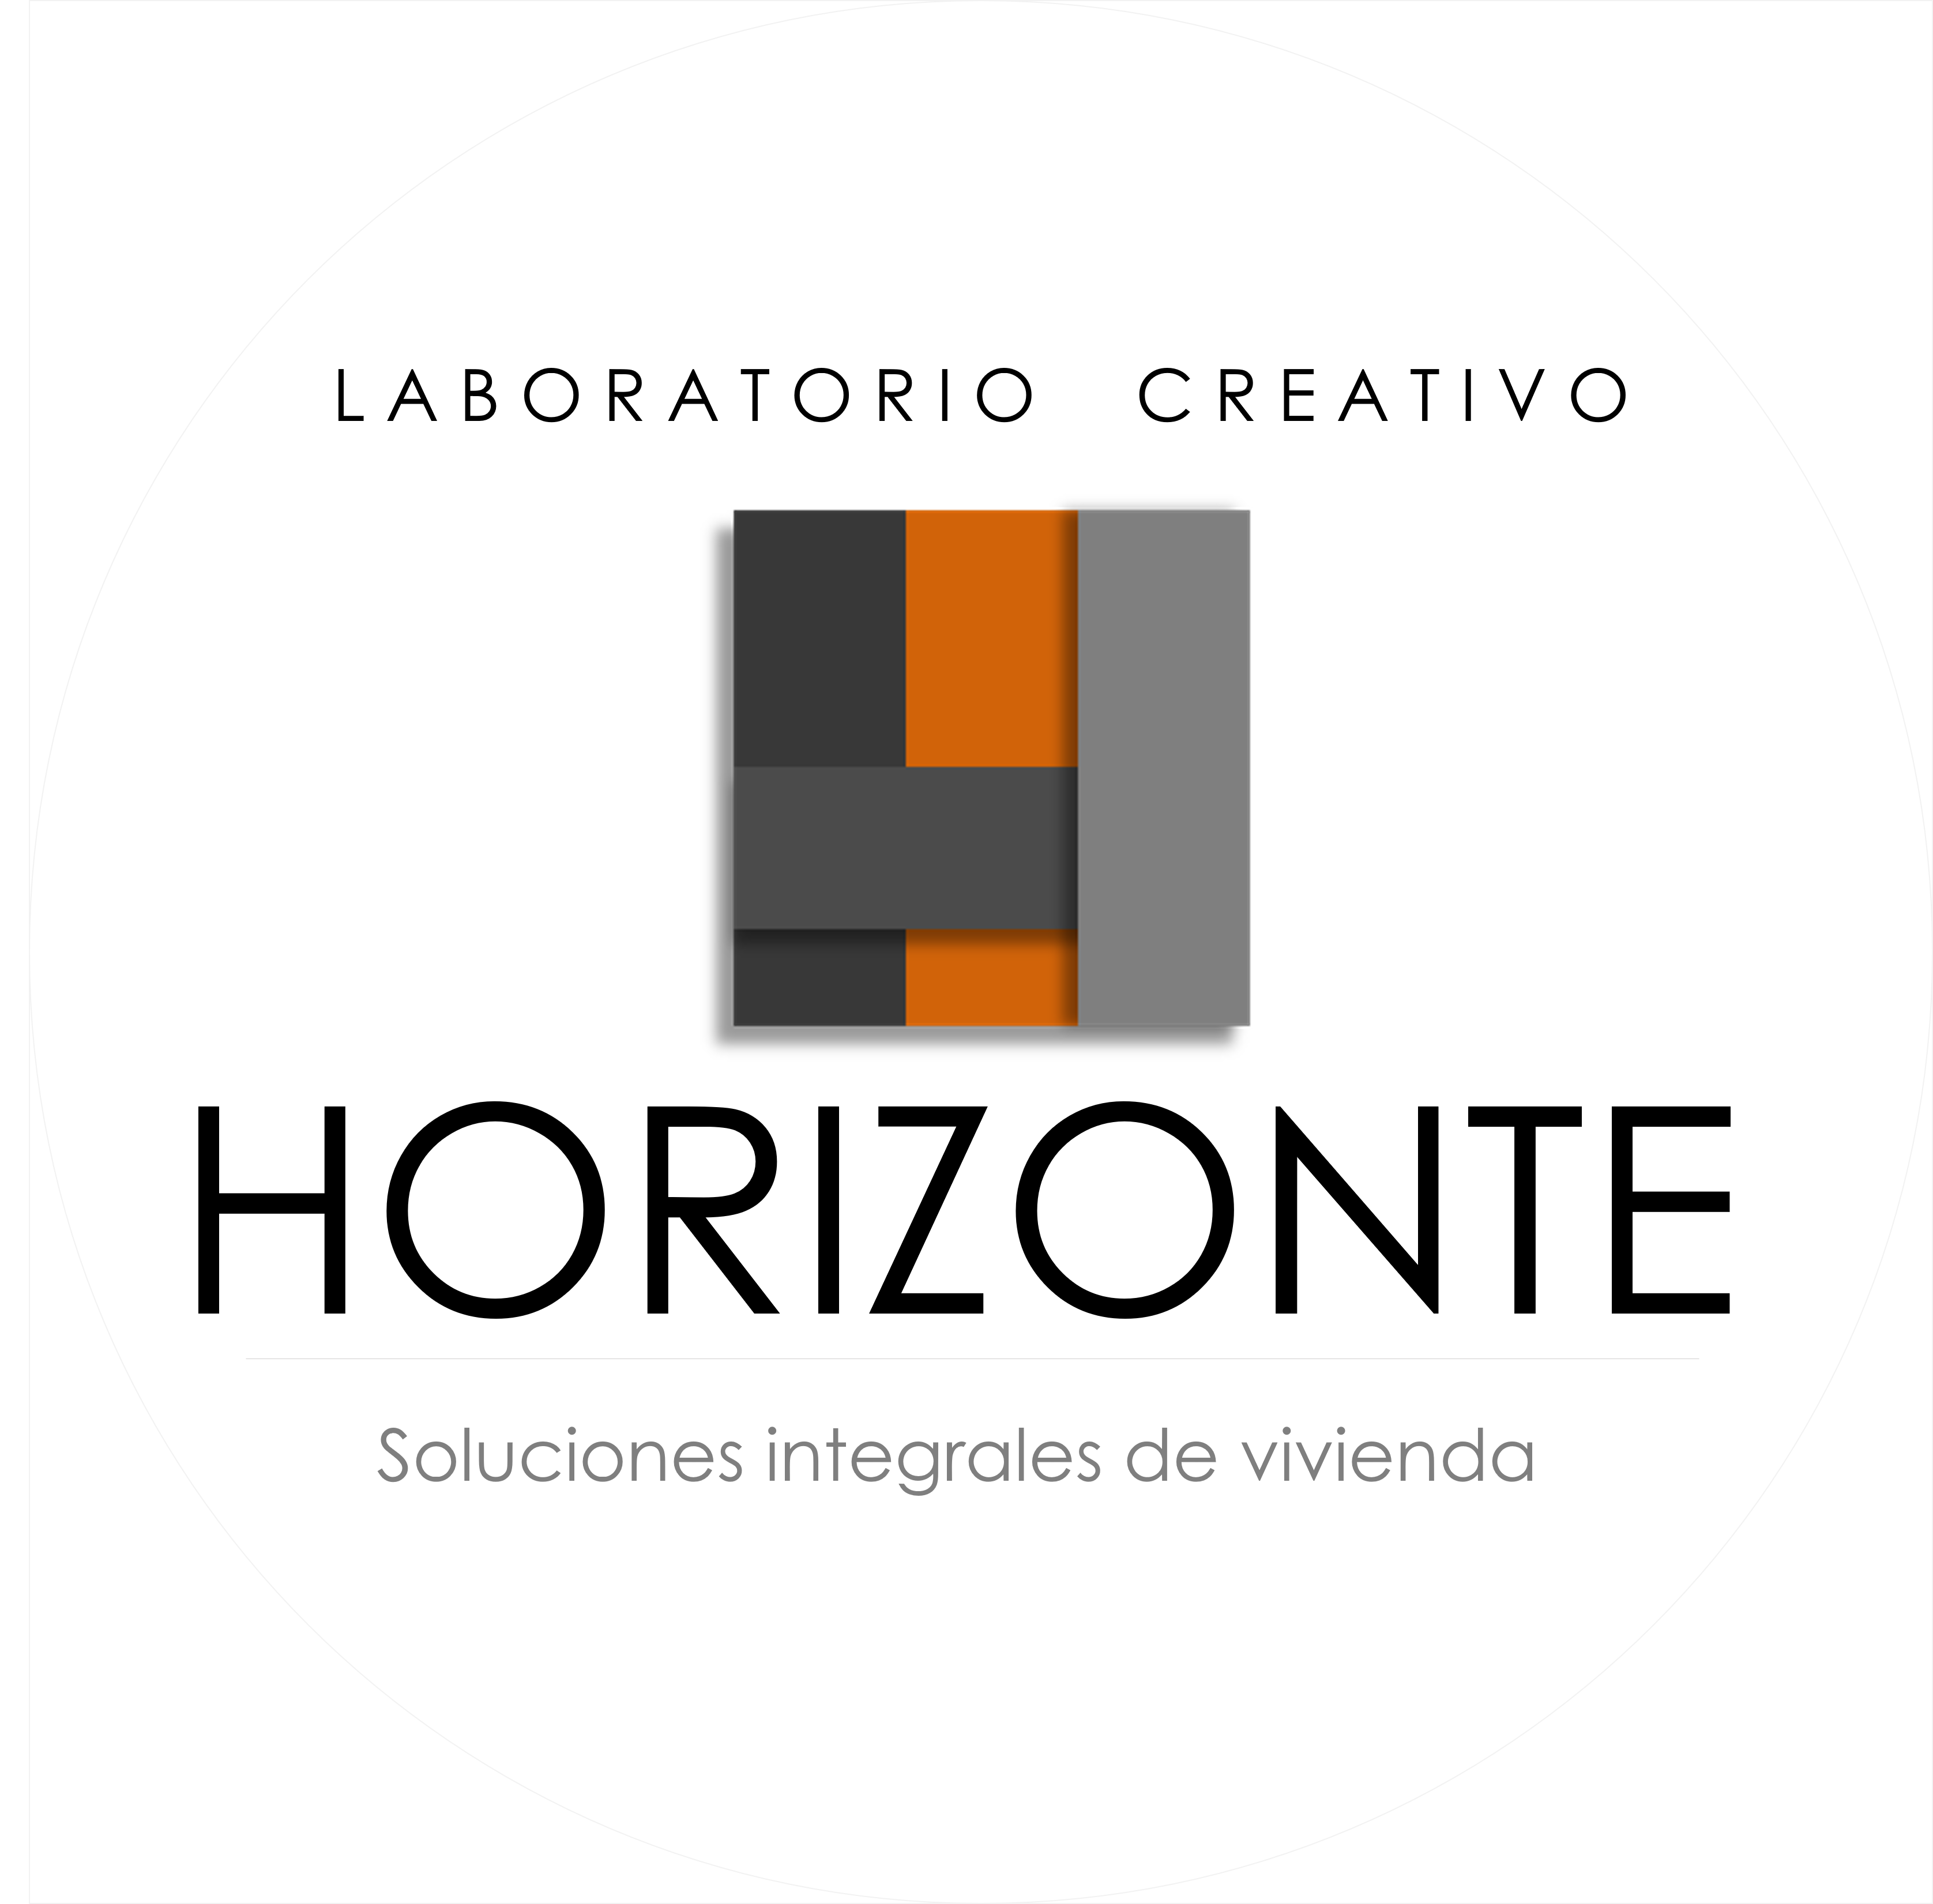 Laboratorio Creativo Horizonte